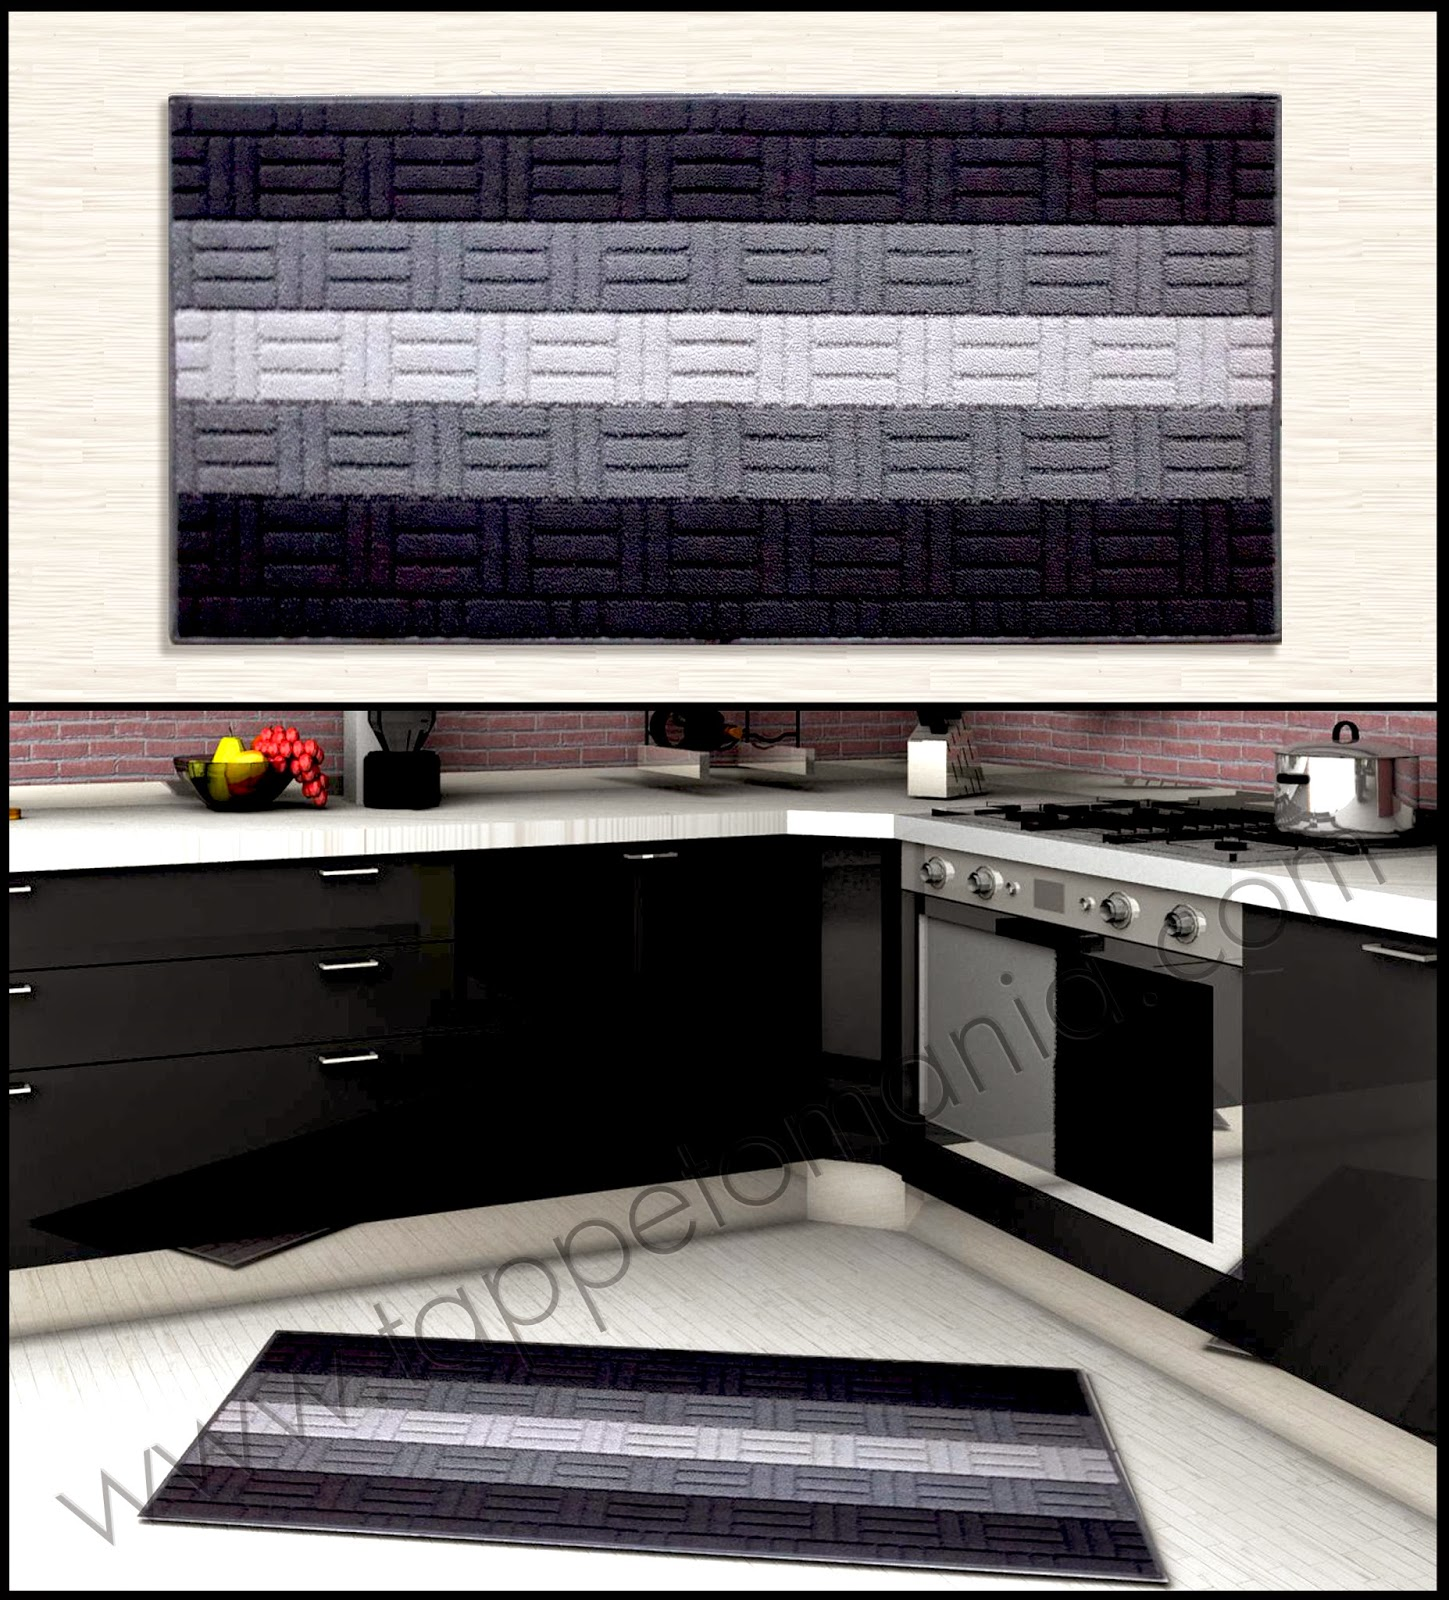 Stuoie per cucina tappeti passatoie tappeti bamboo - Tappeti per cucine ...